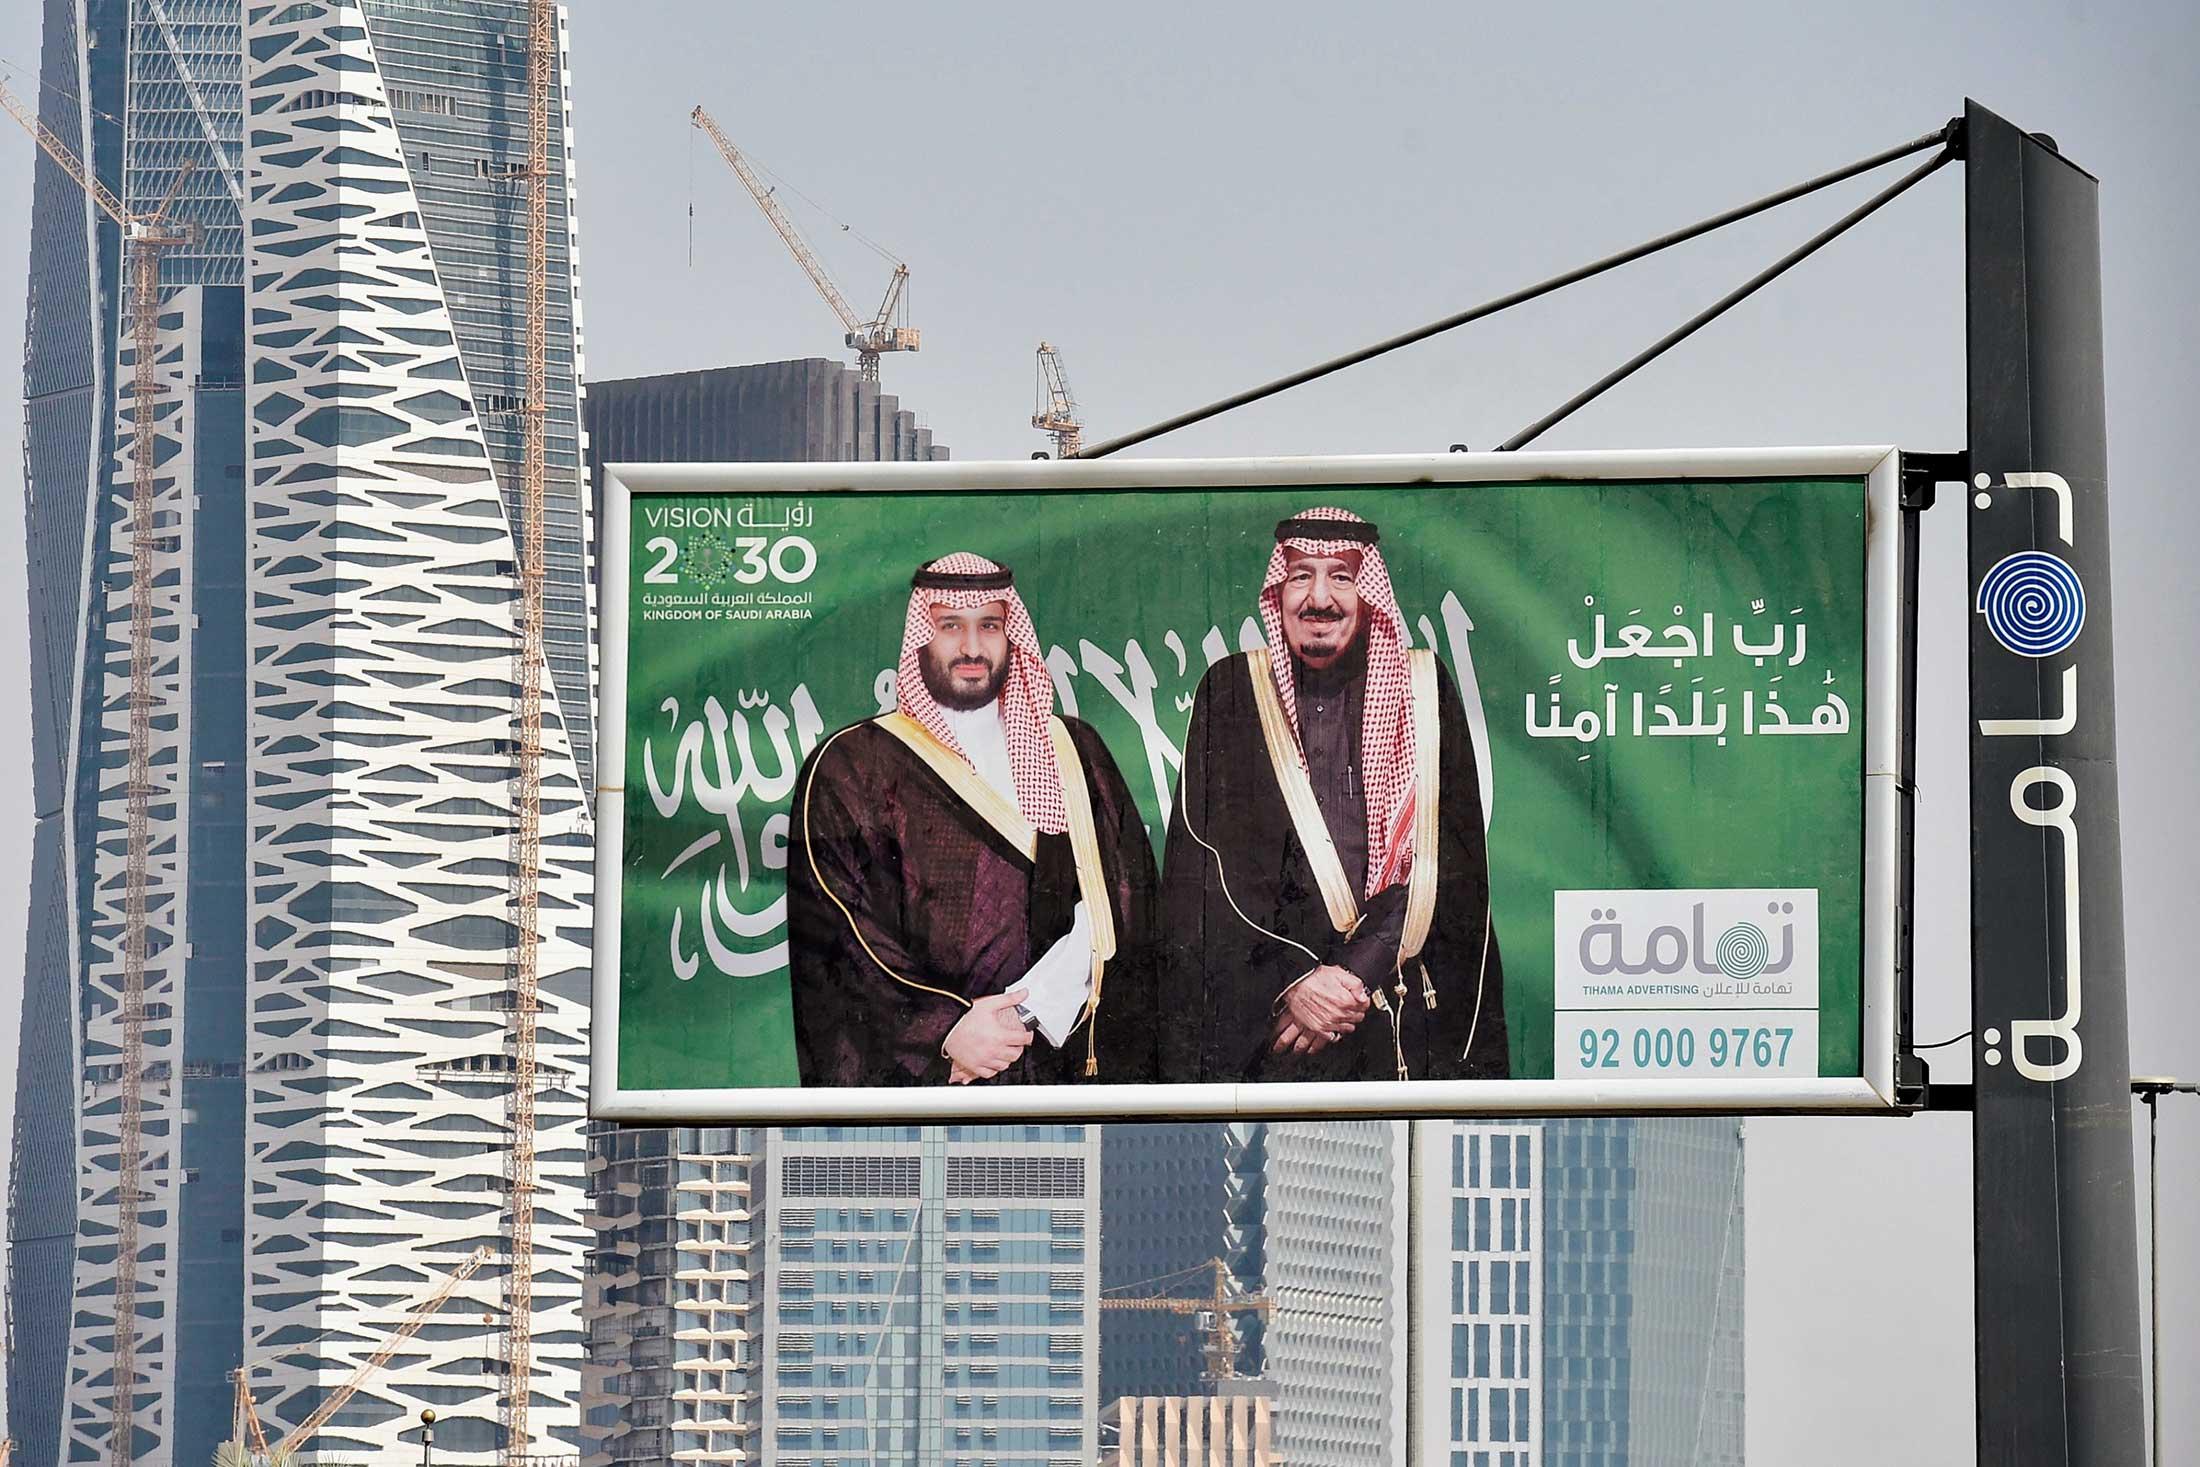 Portraits of Saudi Arabian King Salman and his son, Crown Prince Mohammed Bin Salman, on a printed sign